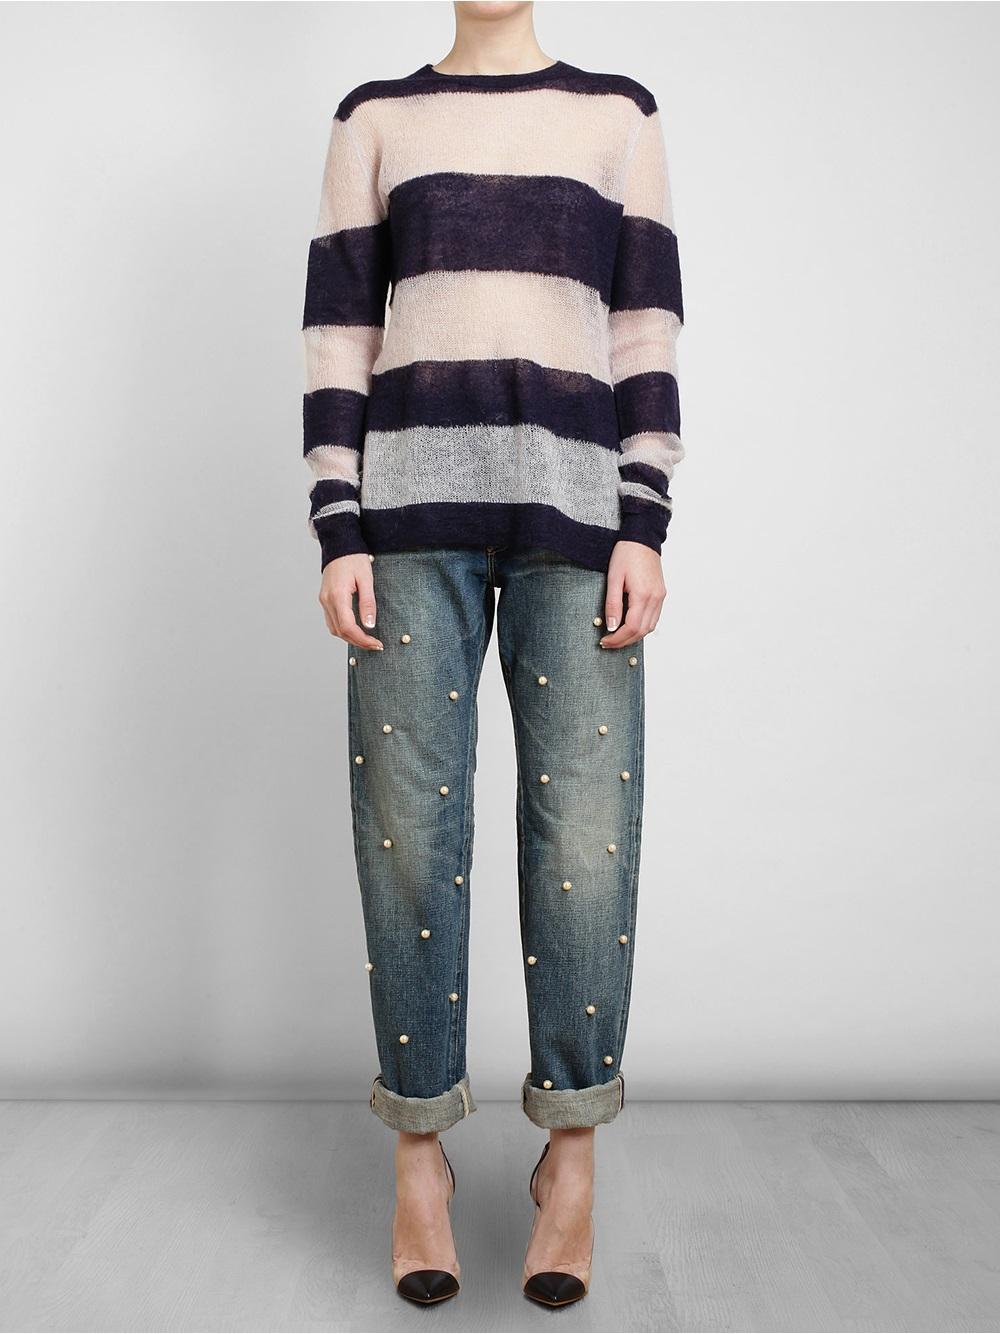 Tu Es Mon Tresor Small Pearl Embellished Boyfriend Jeans in Blue